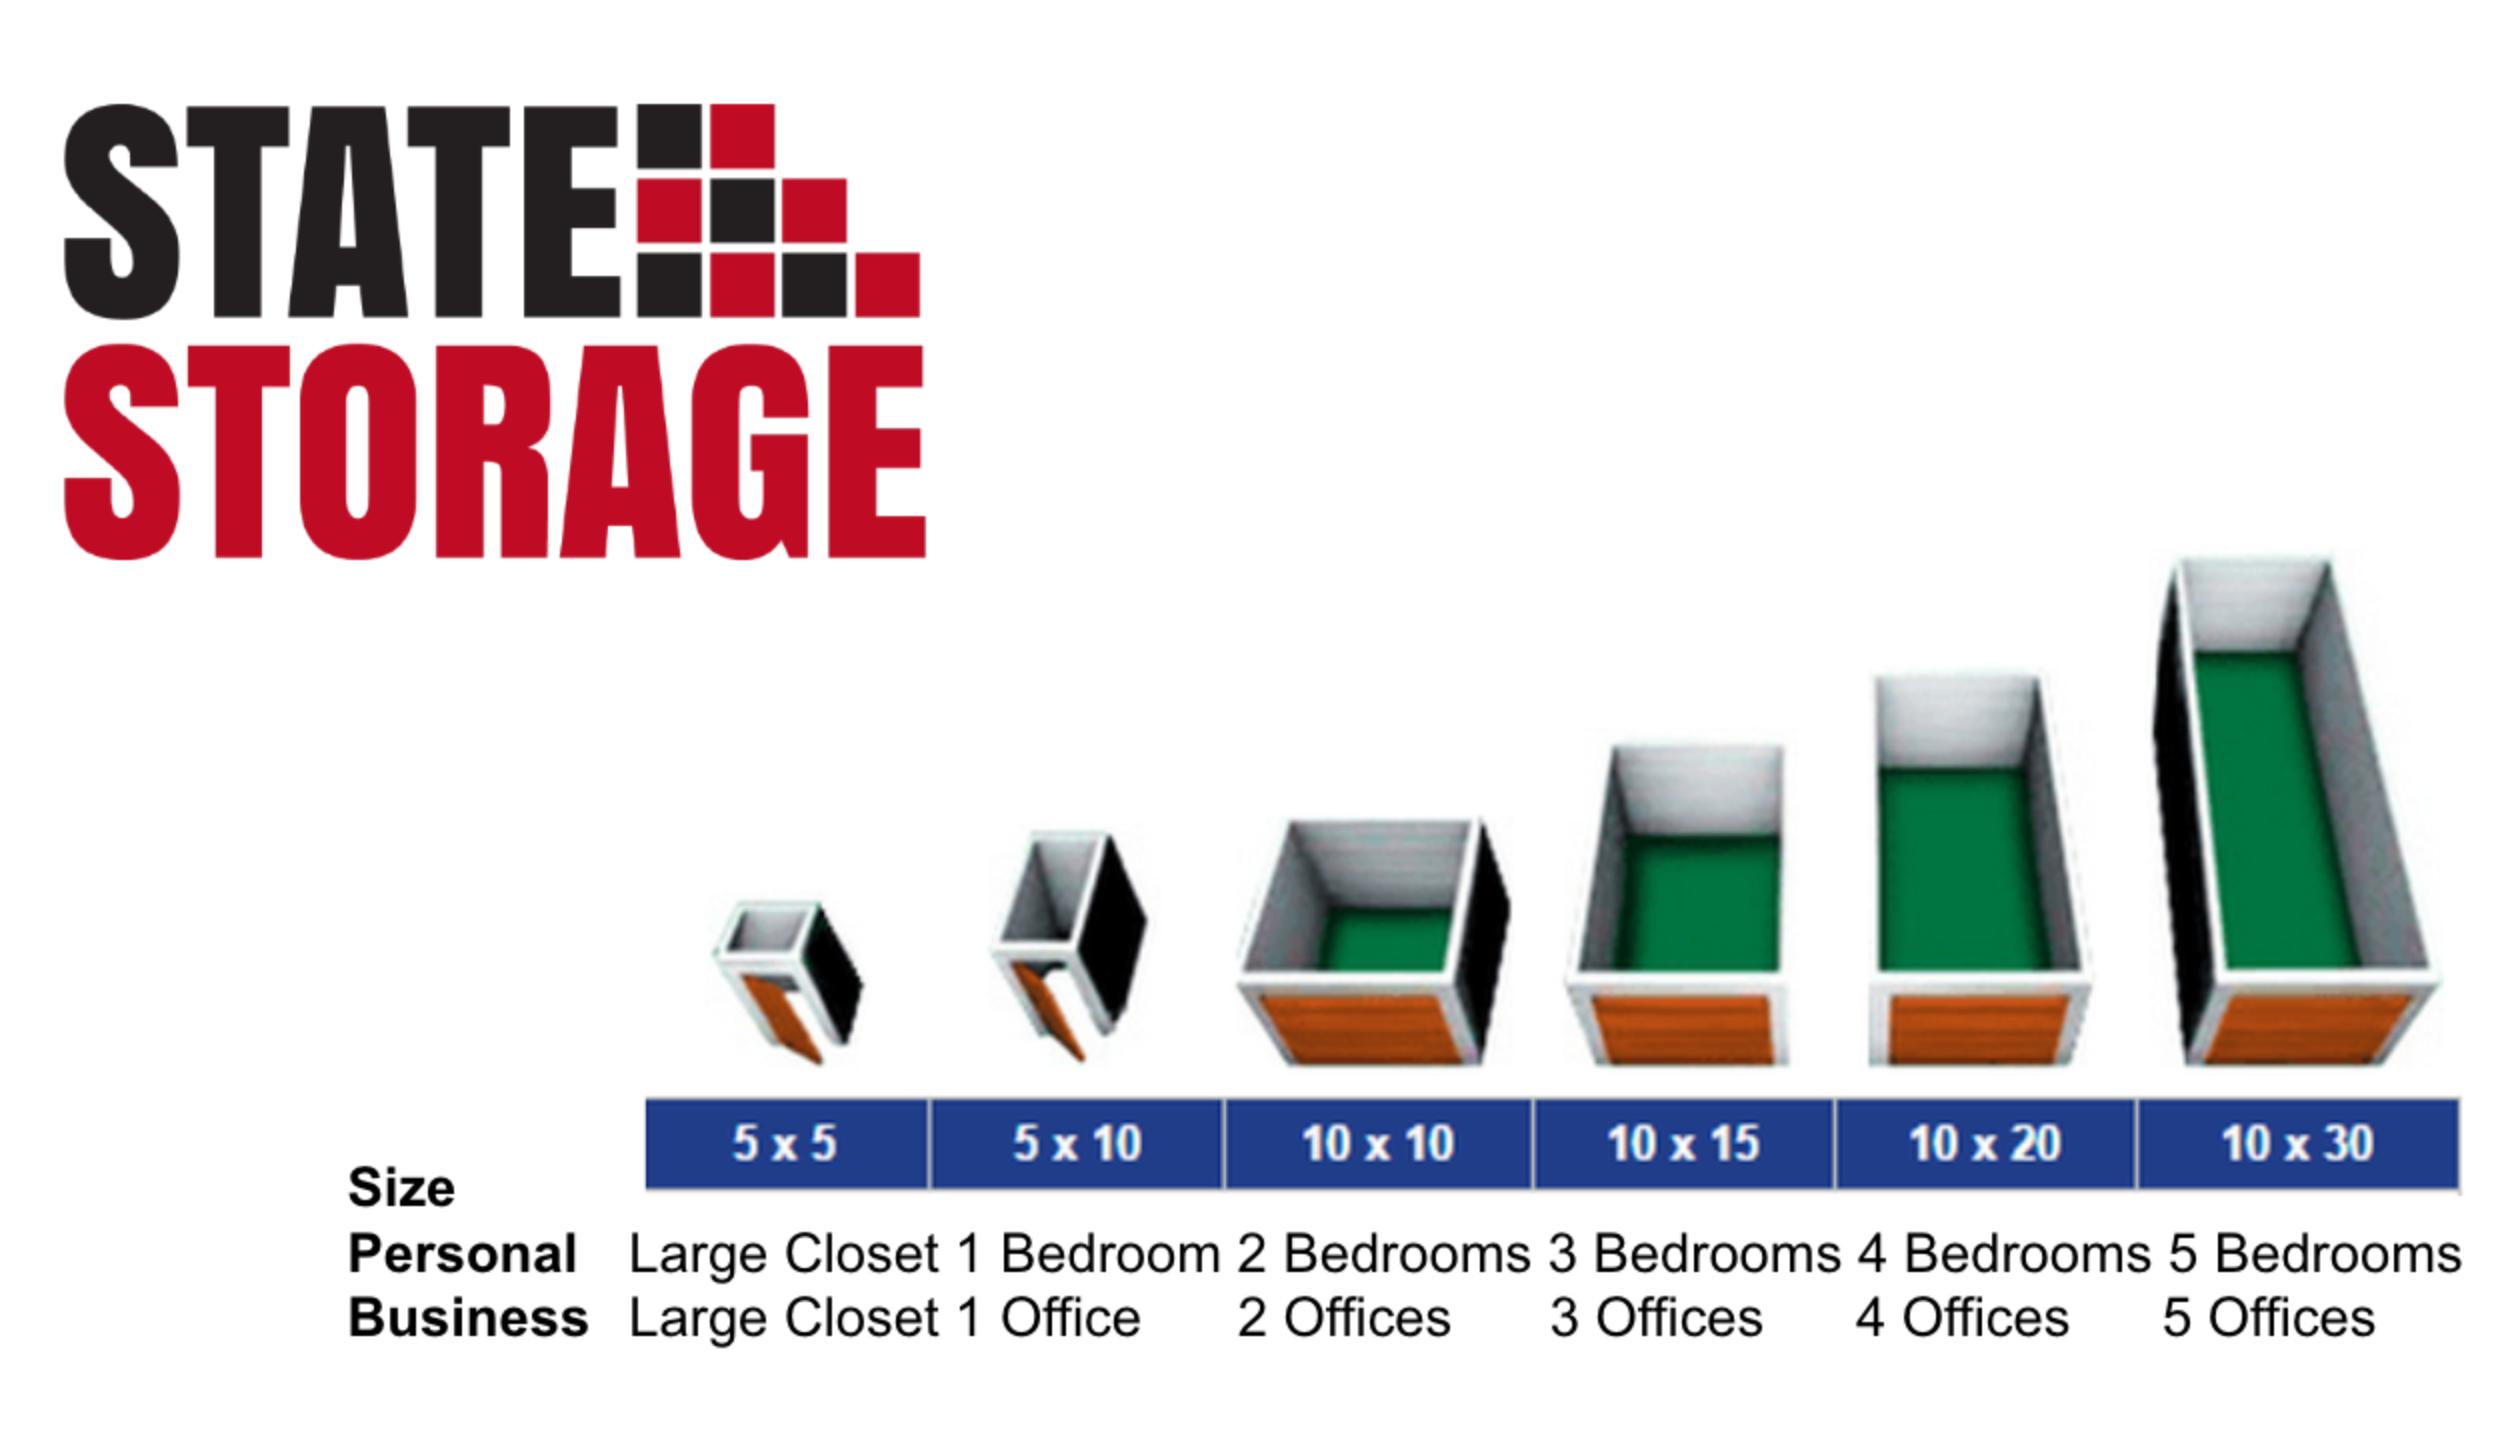 buckeye state storage size chart downtown cleveland